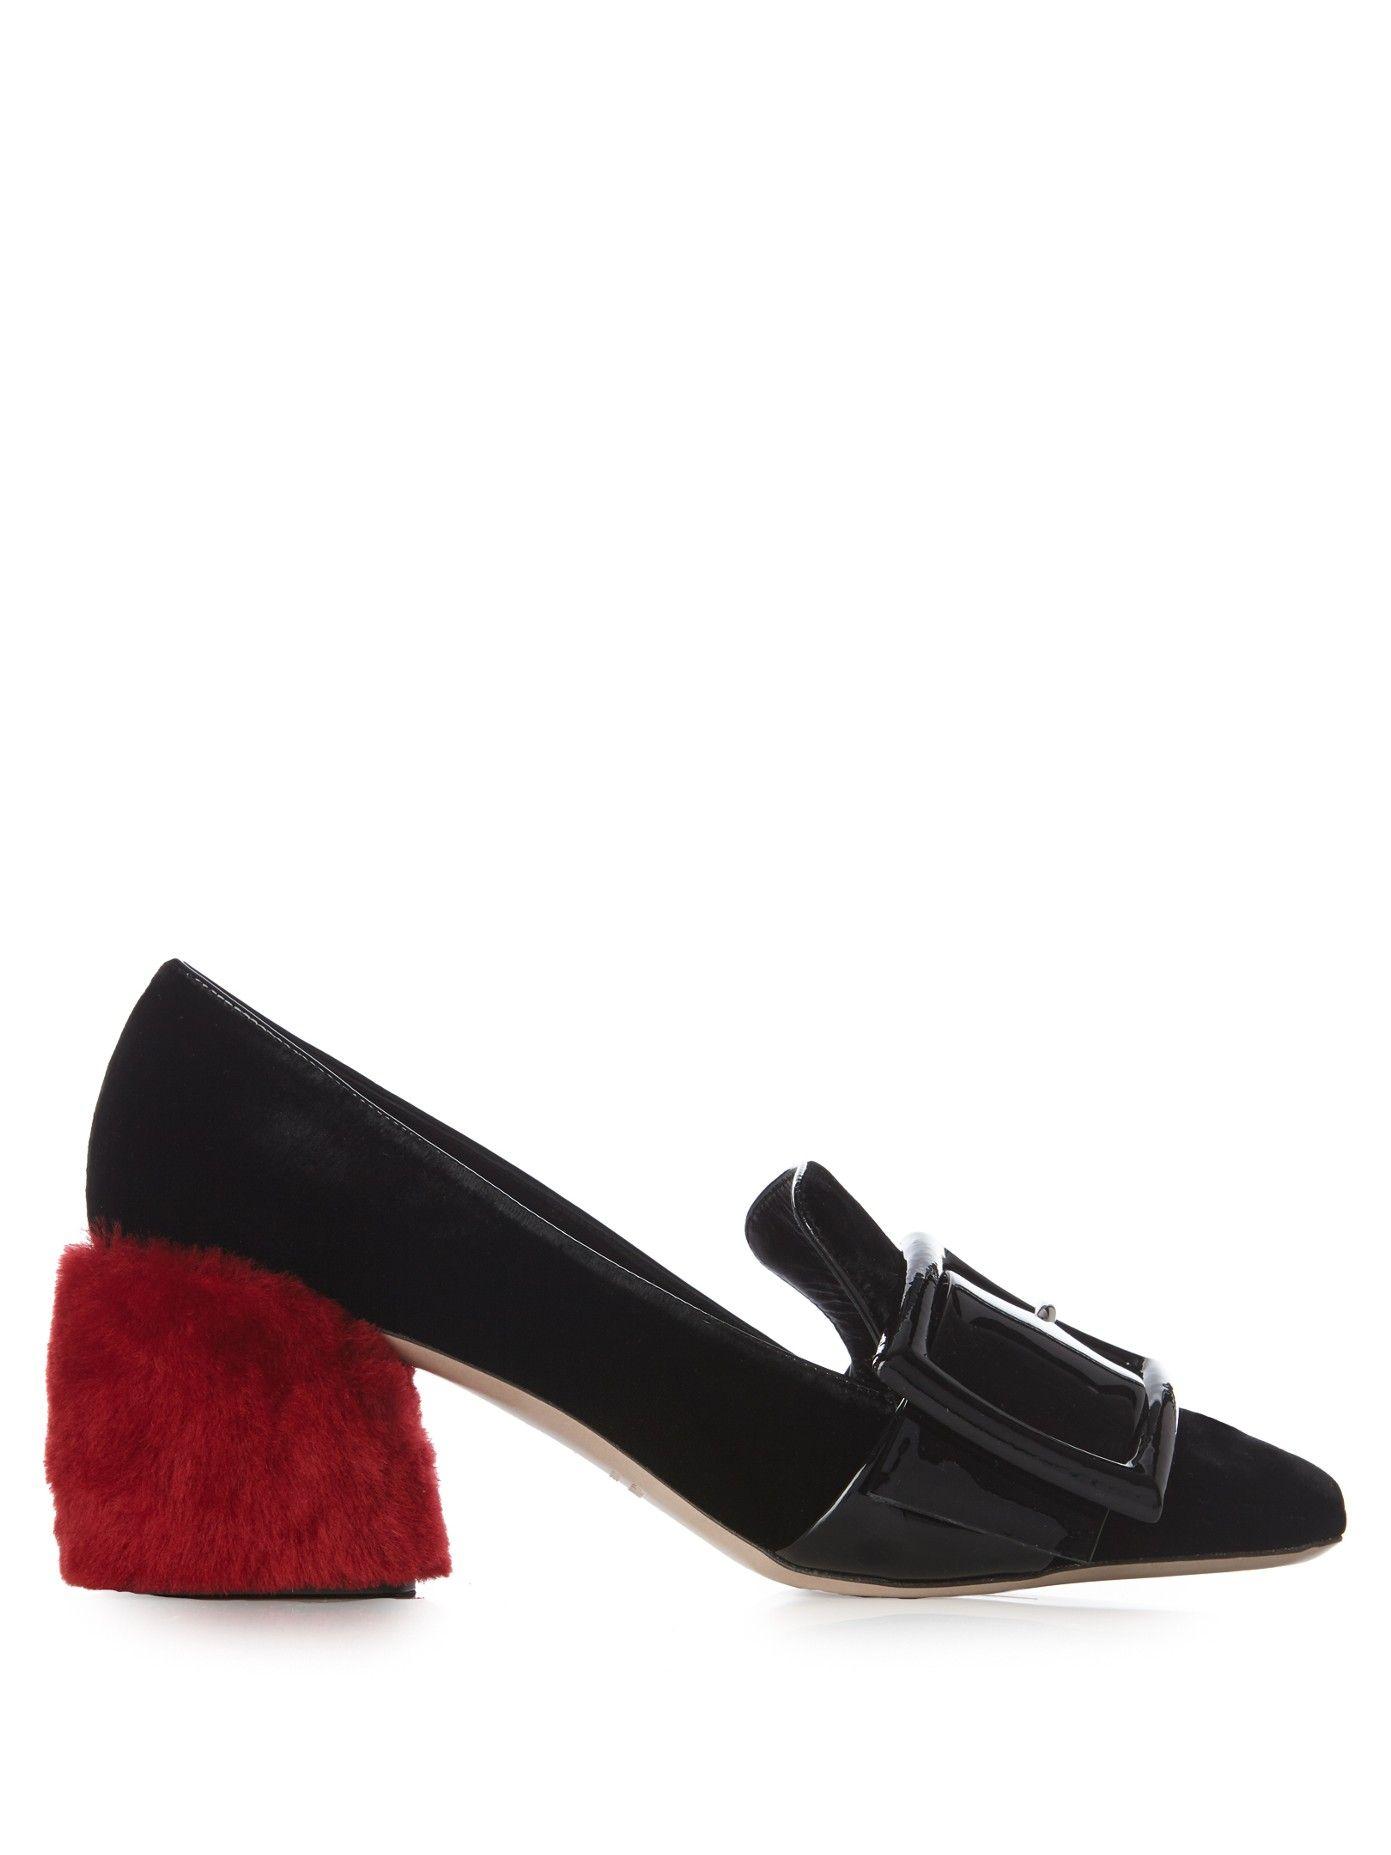 Fur block-heel velvet loafers   Miu Miu   MATCHESFASHION.COM US